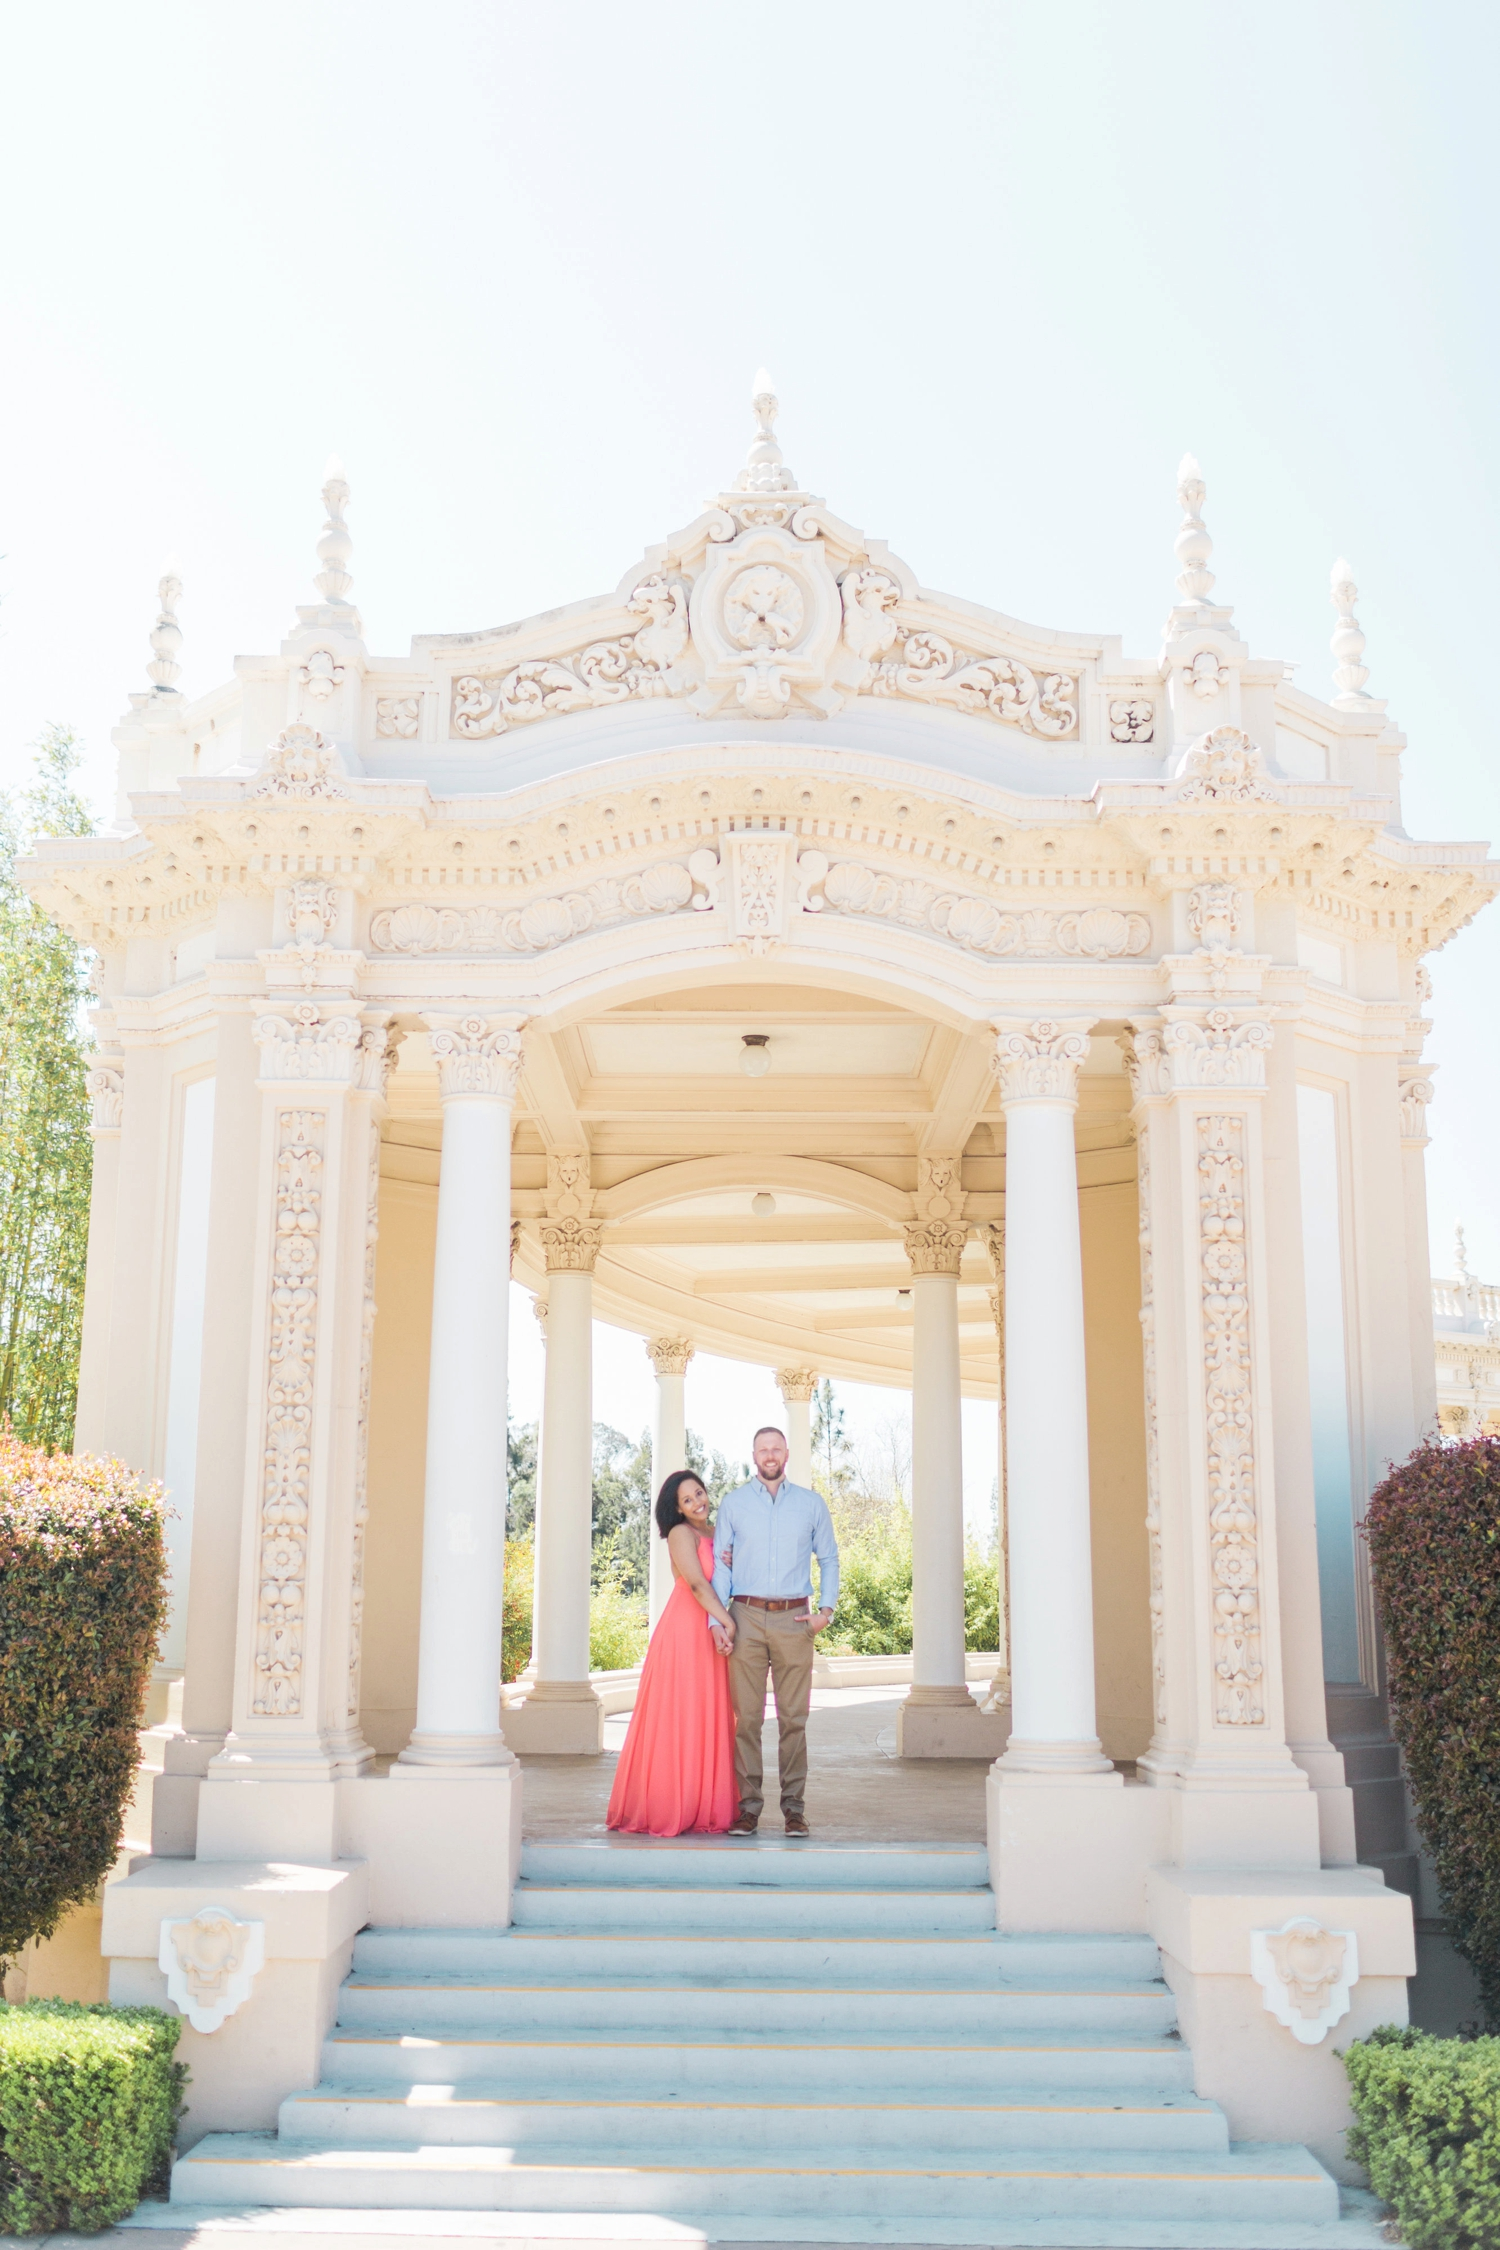 San-Diego-California-Beautiful-Film-Engagement-Wedding-Photographer-Balboa-Park-Sunset-Cliffs-Wedding-Photos_5185.jpg